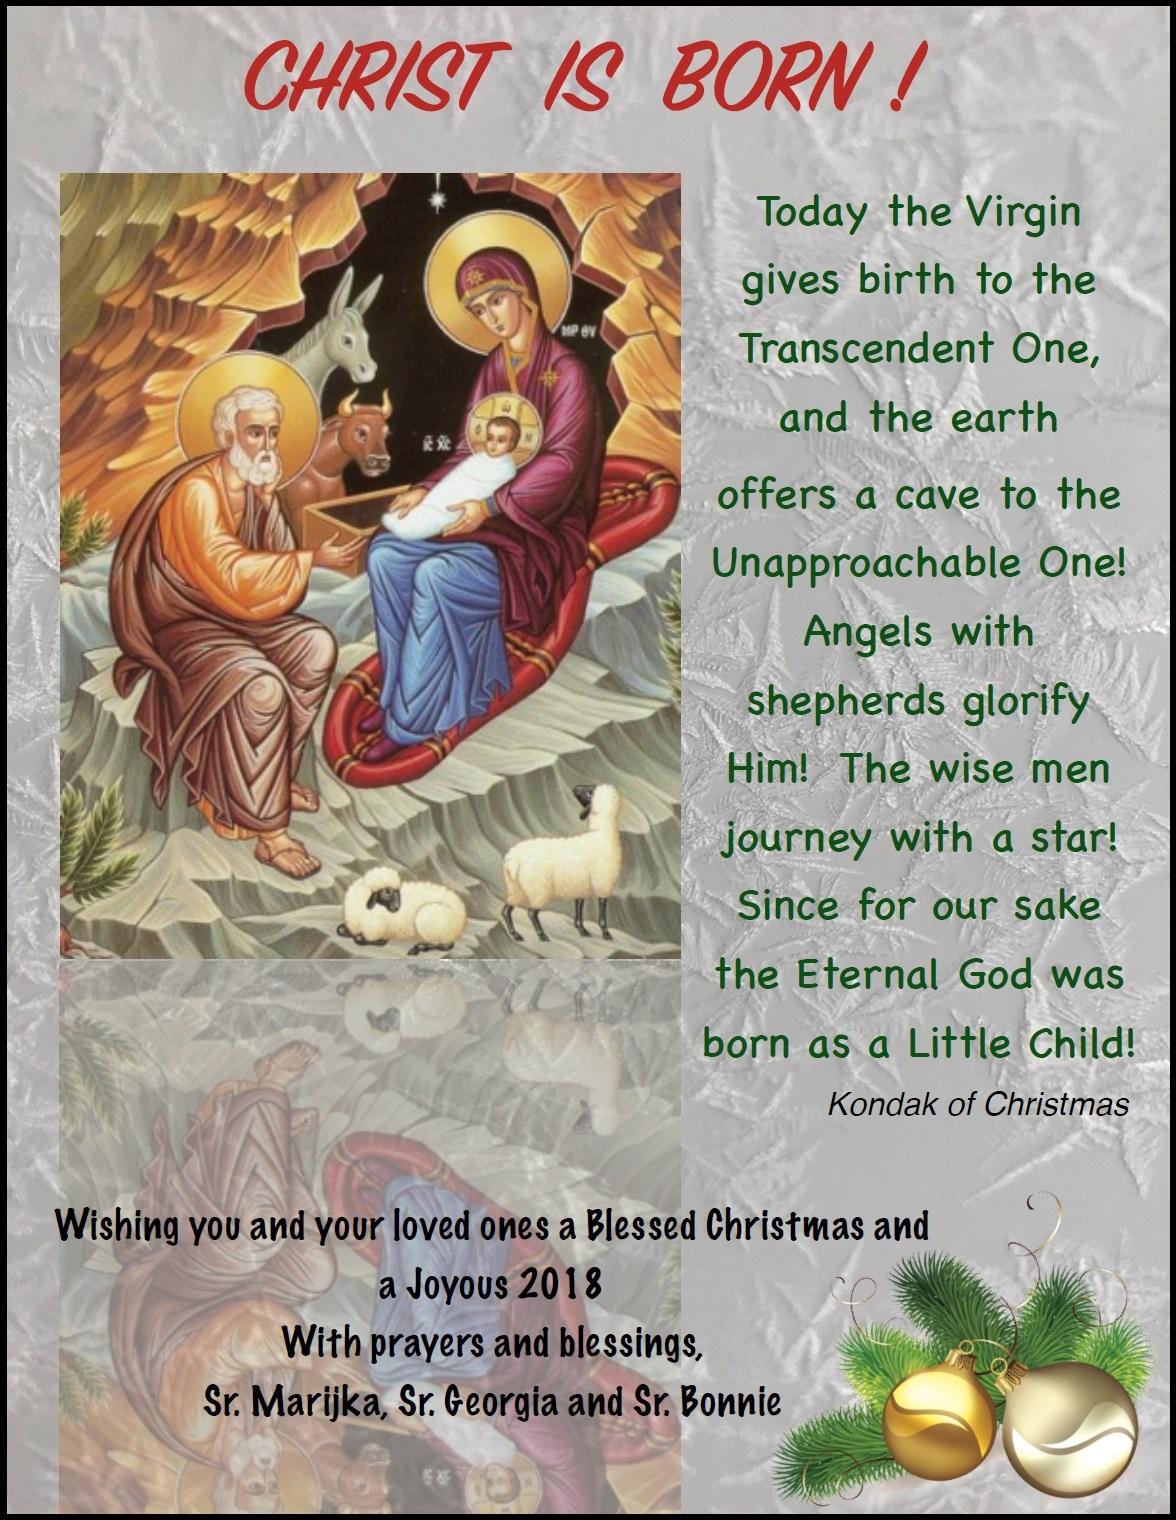 Christmas Greetings From Ukrainian Catholic Eparchy Of Saskatoon BBESI And UCREC